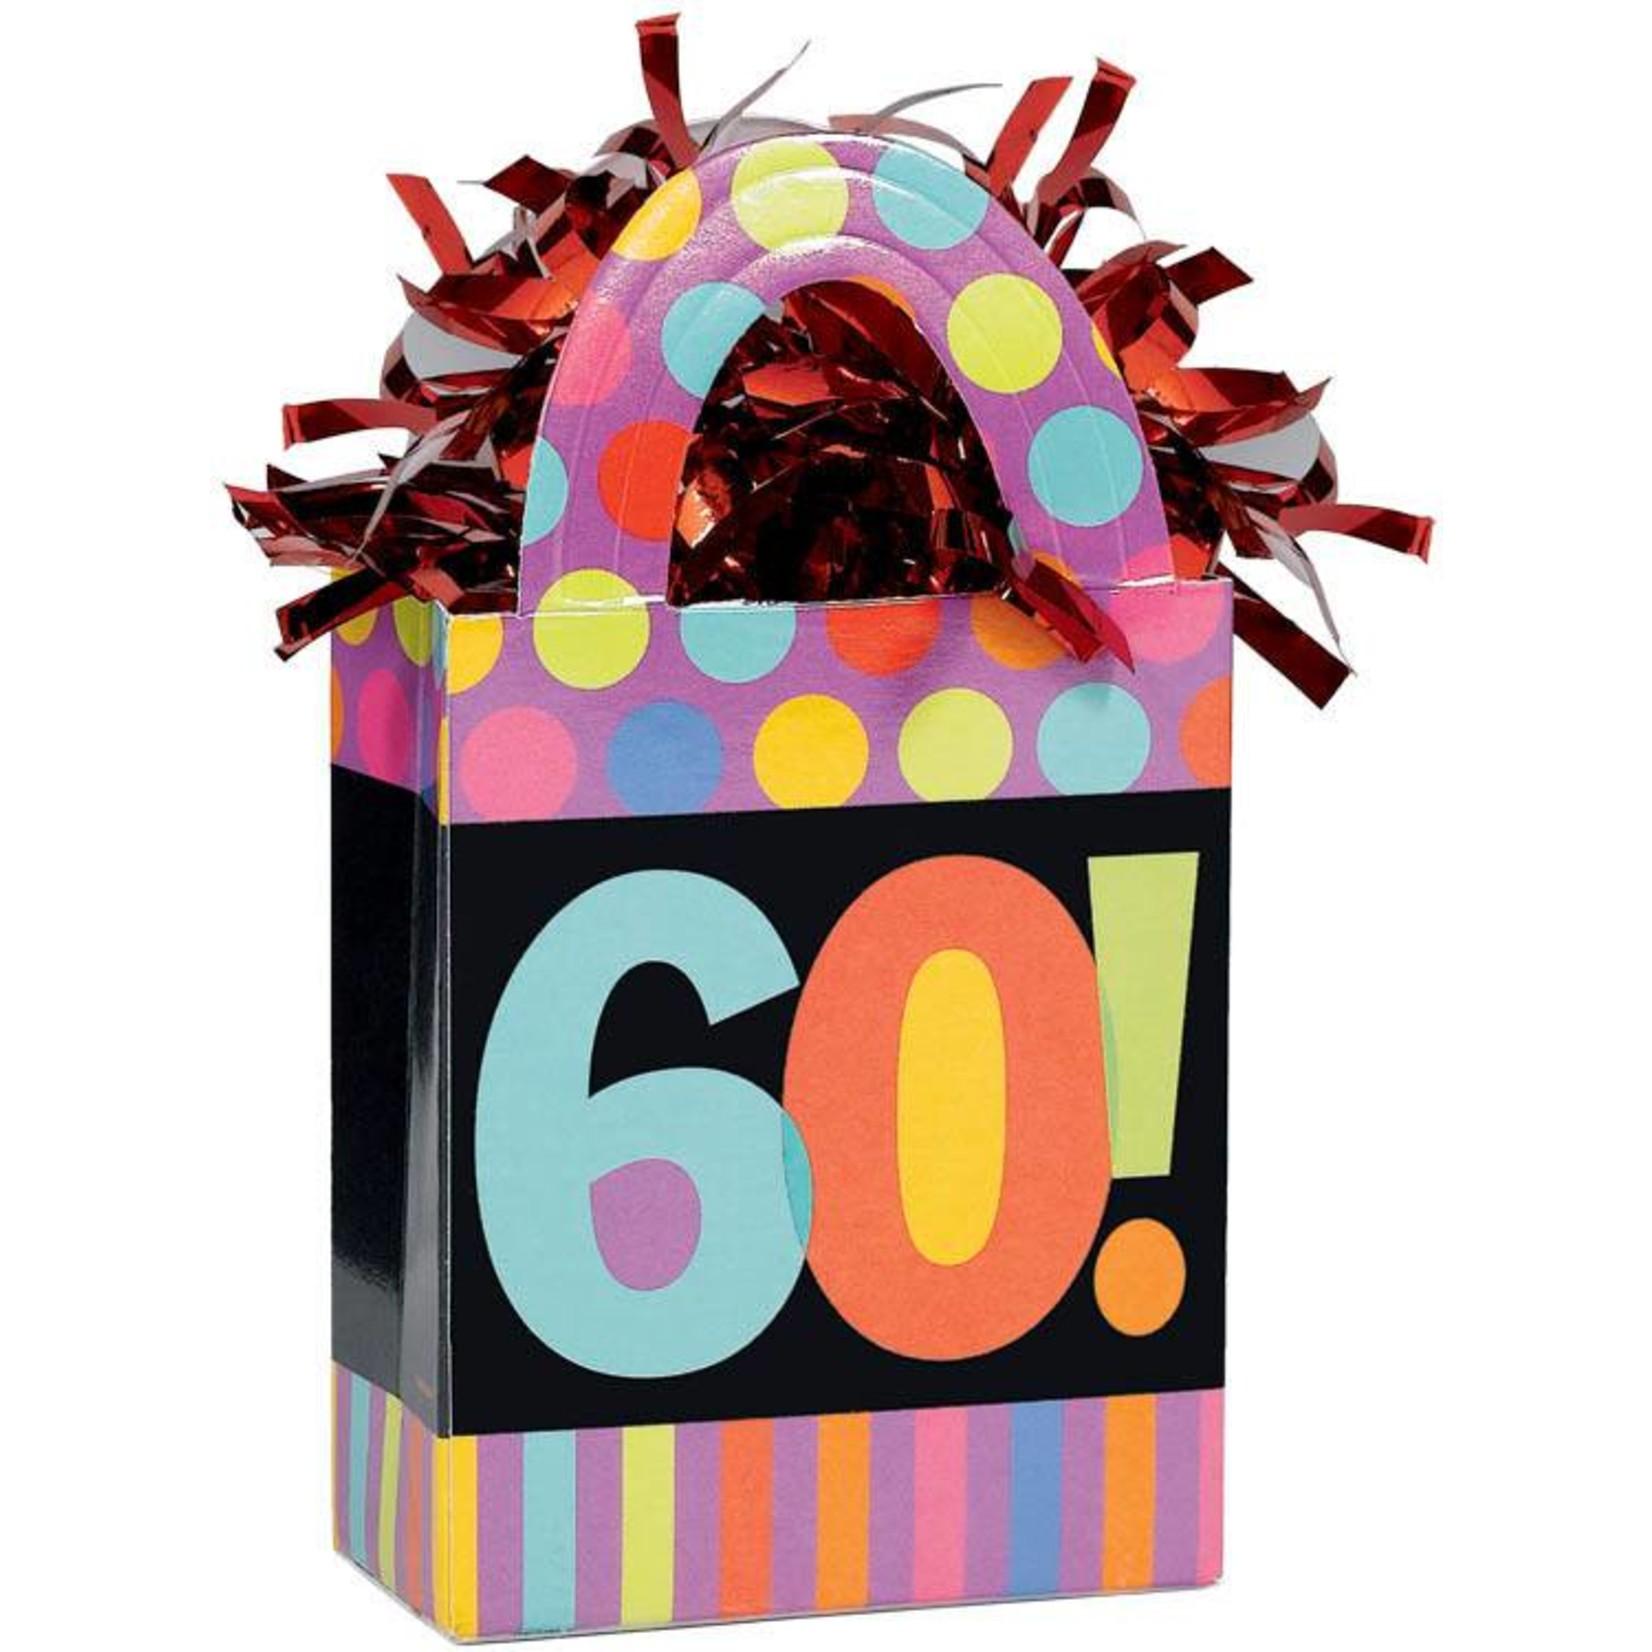 Balloon Weight-Dots & Stripes 60th Bday-5.7oz